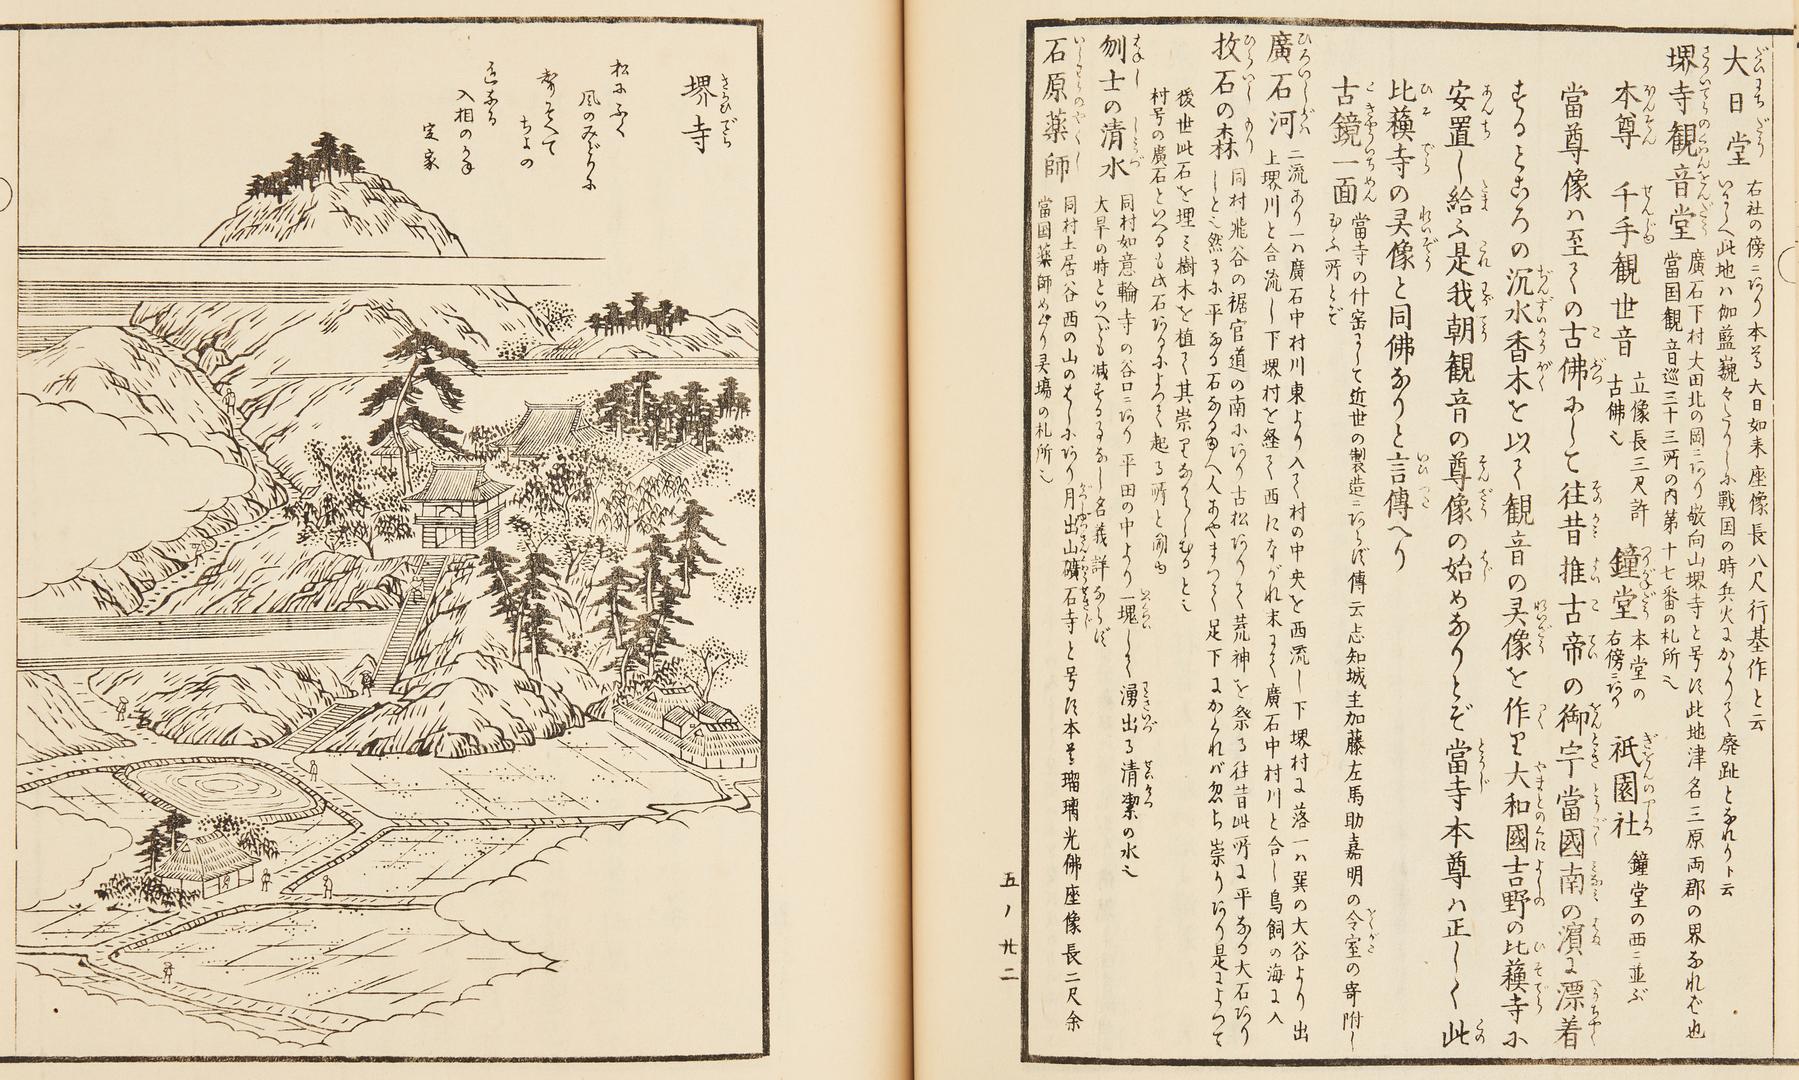 Lot 340: Akatsuki – Woodblock views of Awaji no Kuni